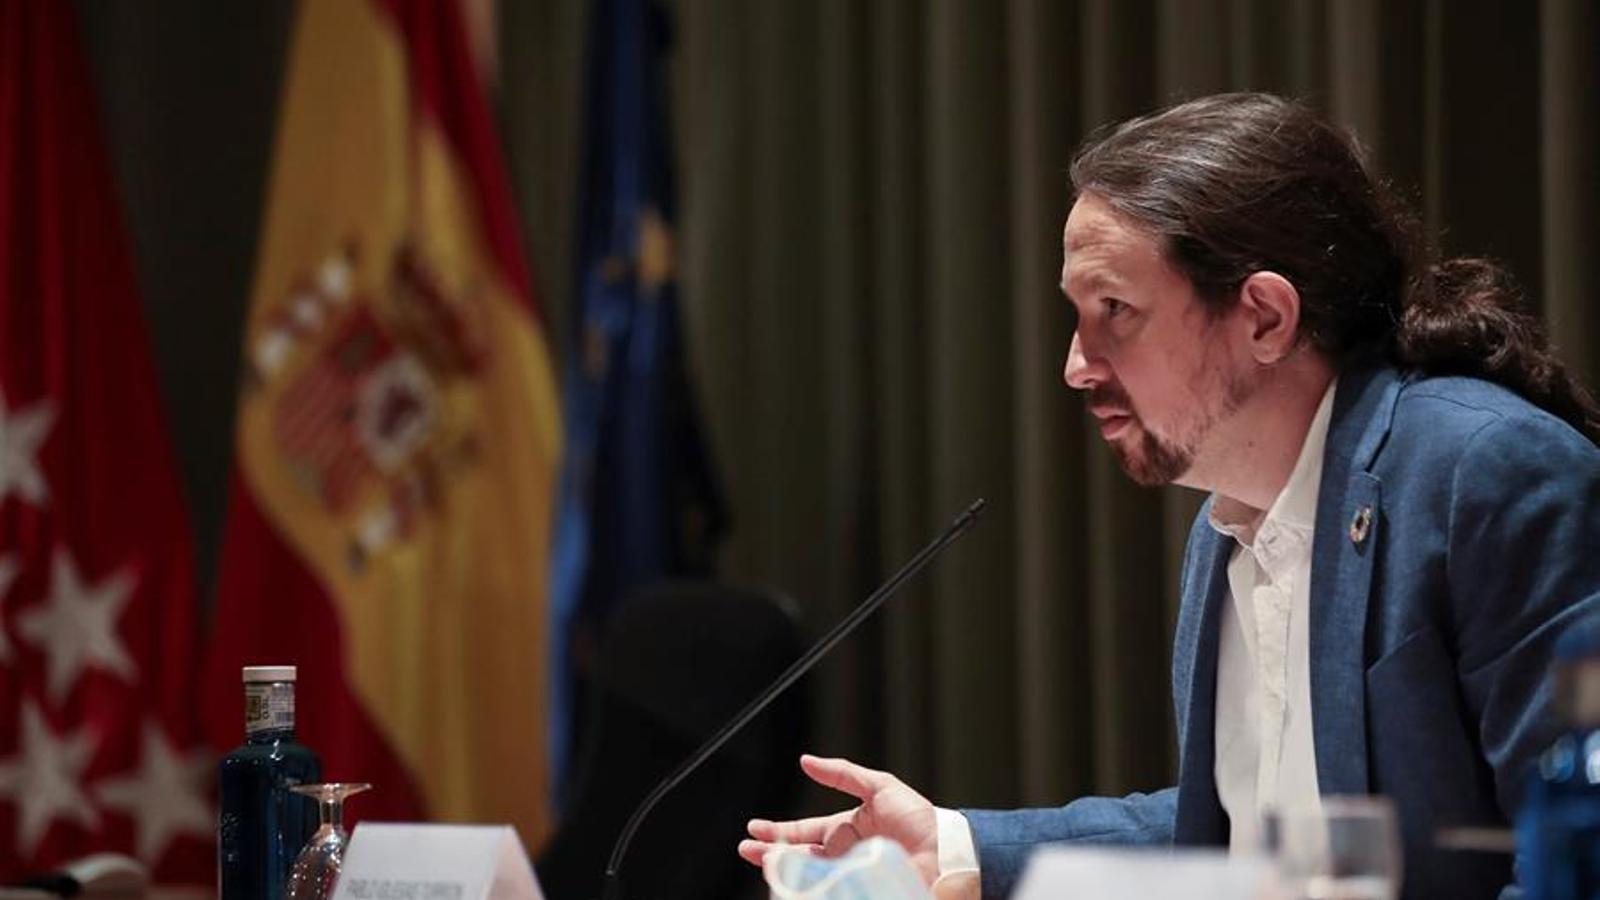 El vicepresident segon del govern espanyol, Pablo Iglesias, en una imatge d'arxiu.